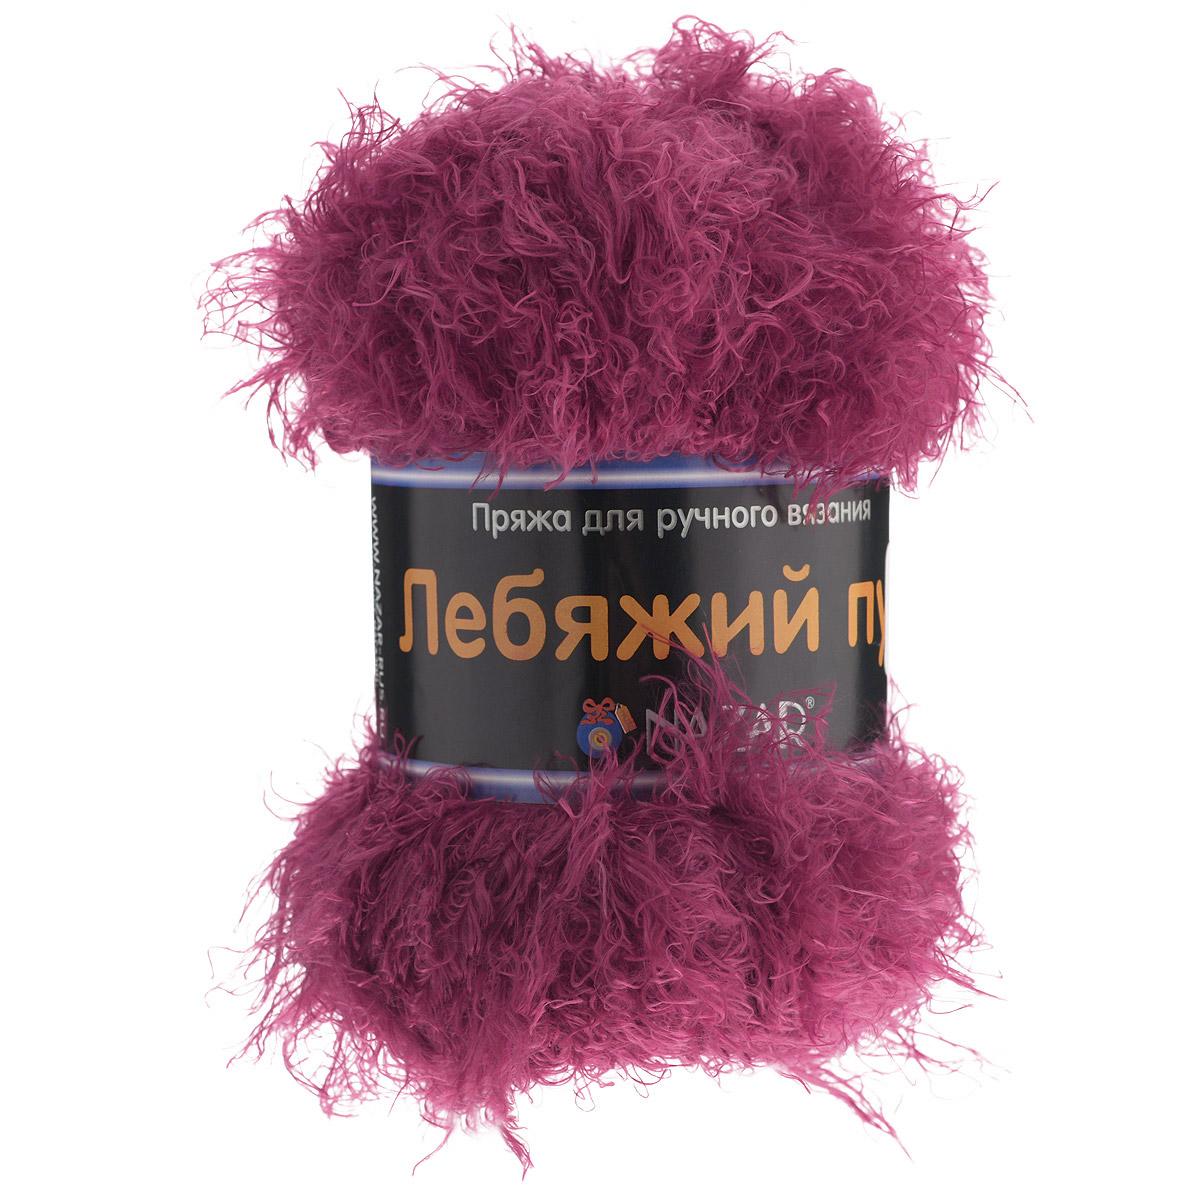 Пряжа для вязания Nazar Лебяжий пух, цвет: брусника (2744), 100 г, 170 м, 5 шт349020_2744